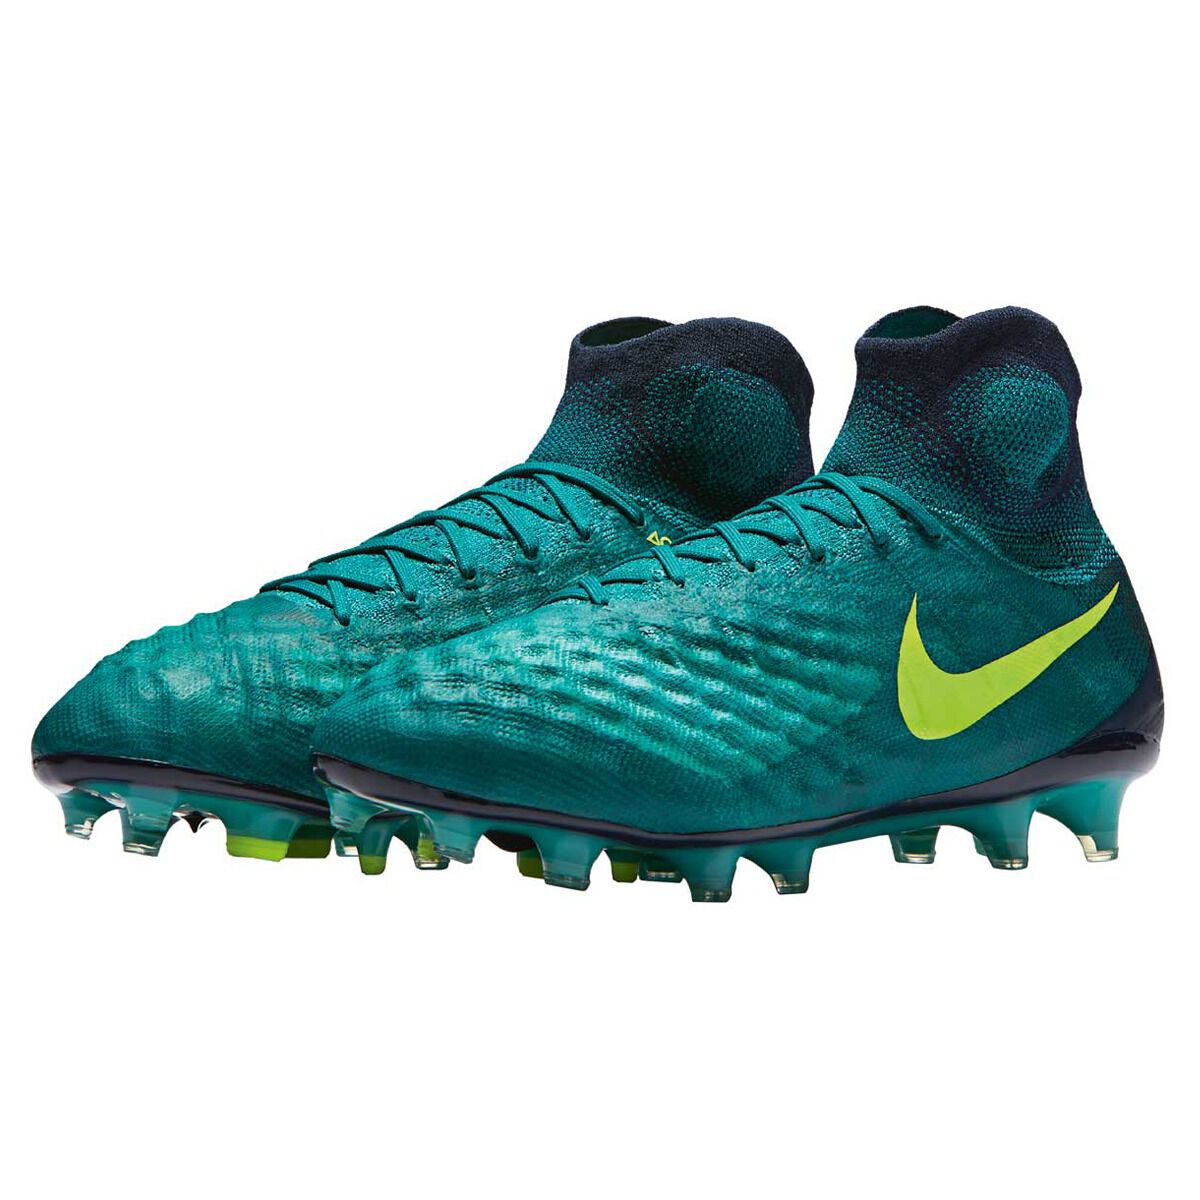 469935962 ... purchase nike magista obra ii mens football boots rio teal volt us 8  adult rio 64b01